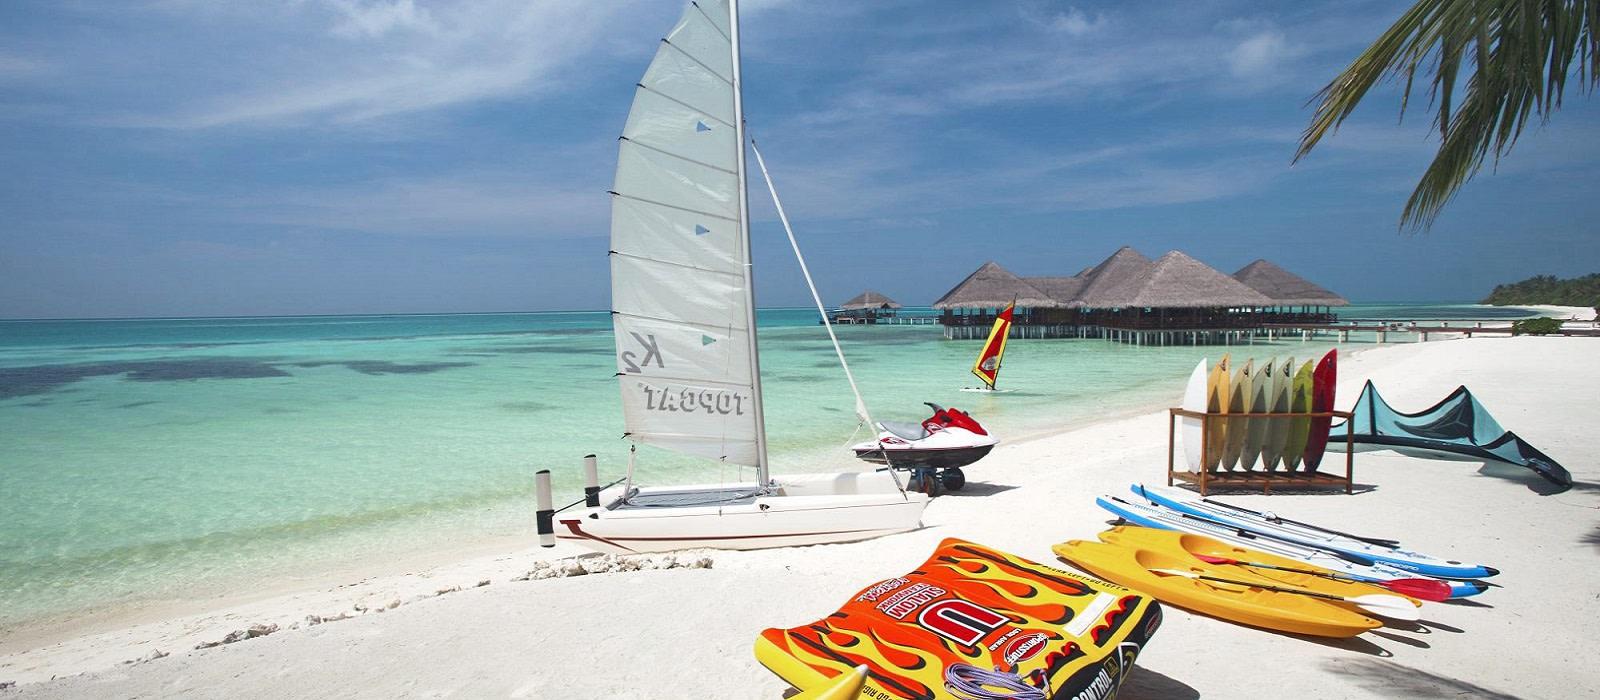 Maldives: Luxury Honeymoon Tour Trip 1